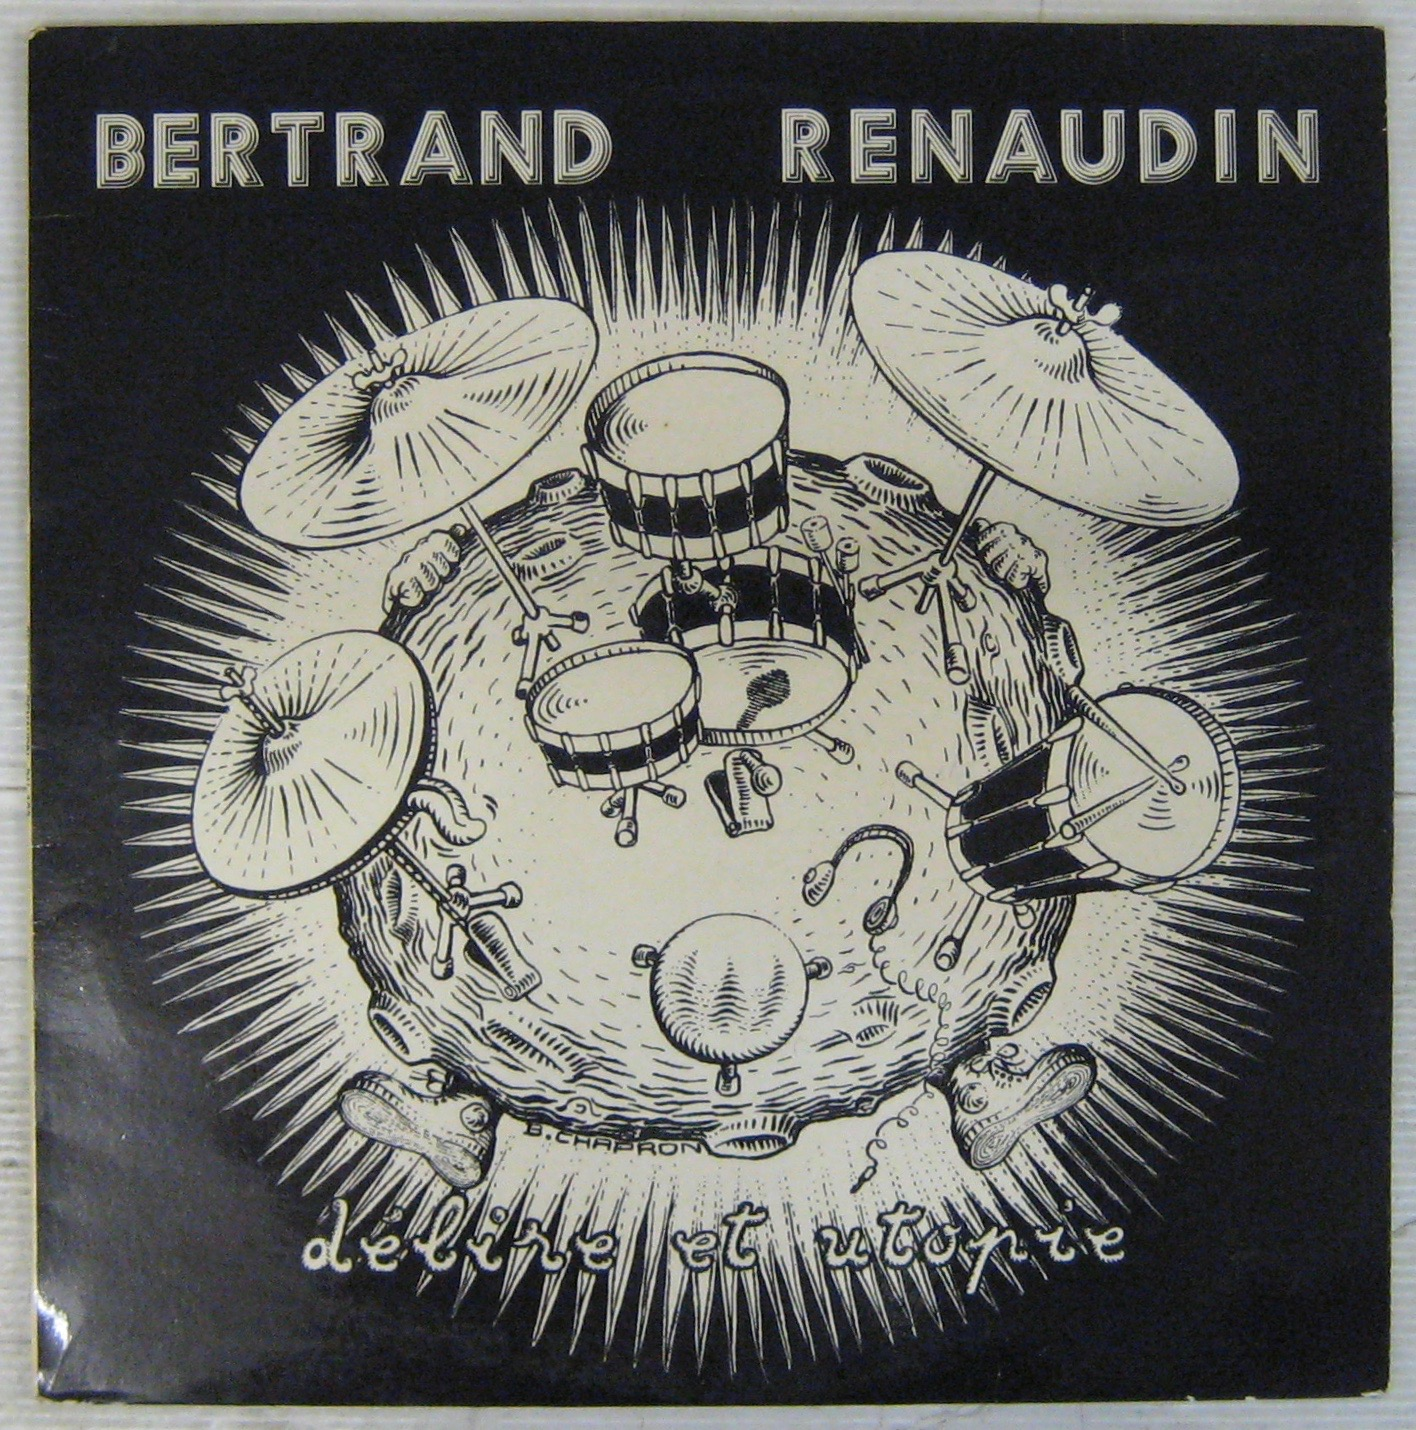 RENAUDIN BERTRAND - Délire et utopie - LP